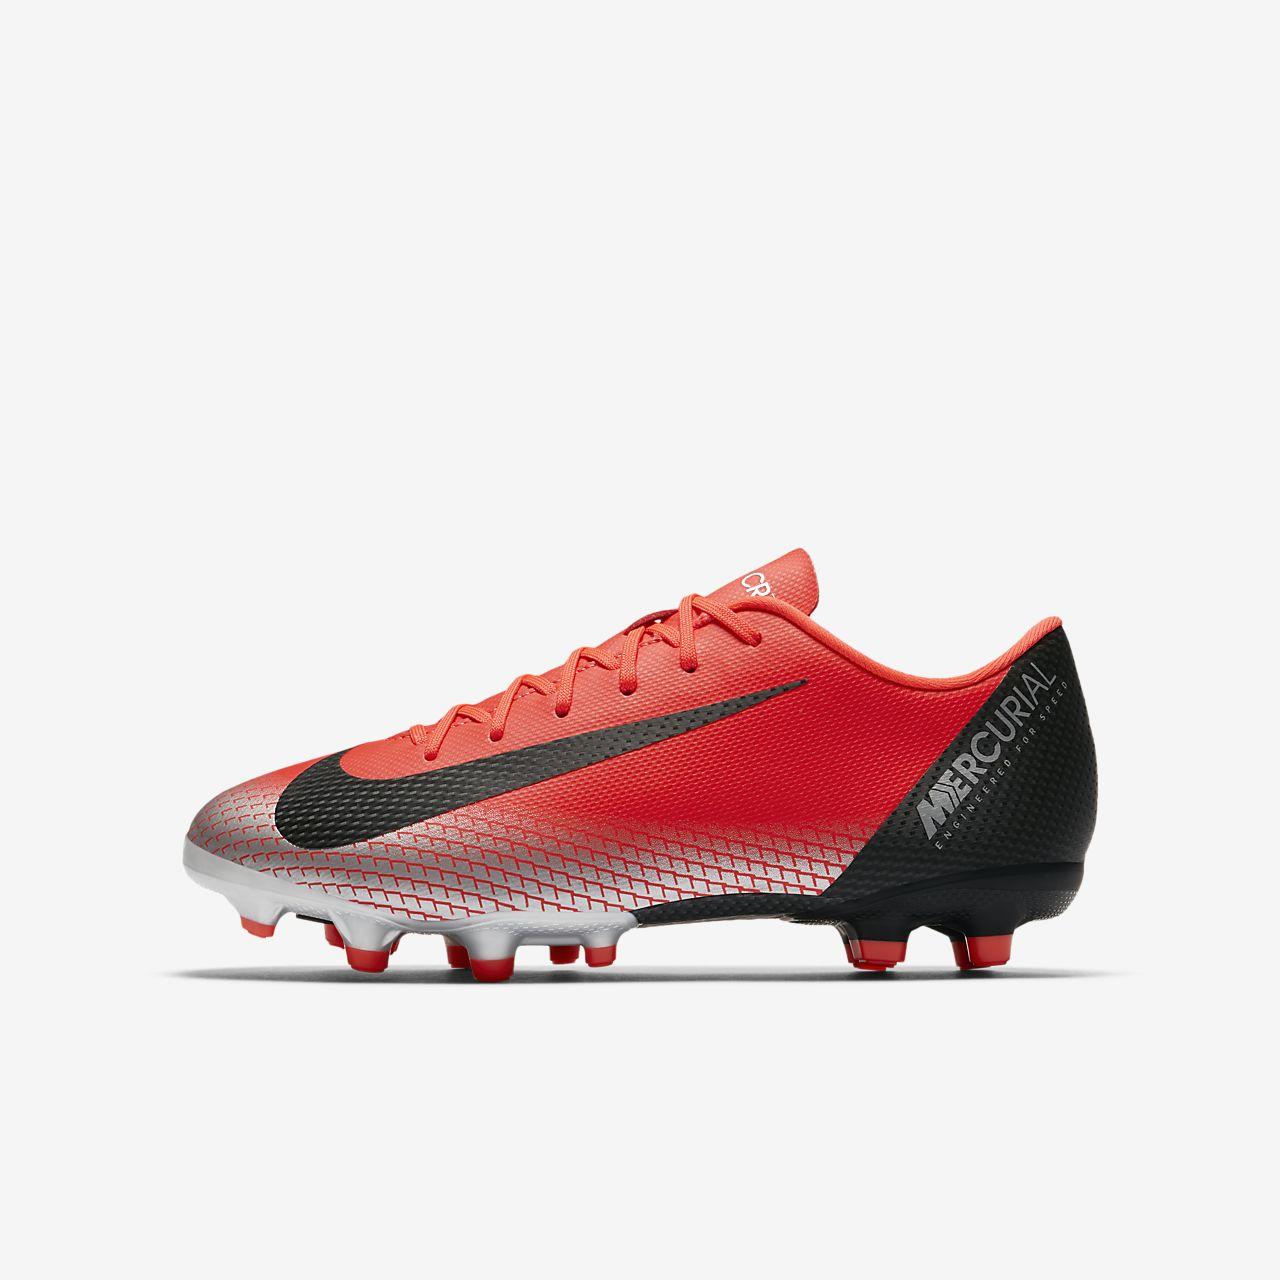 ... Calzado de fútbol para múltiples superficies para niños talla  pequeña grande Nike Jr. Mercurial 8b58d41e2ada7